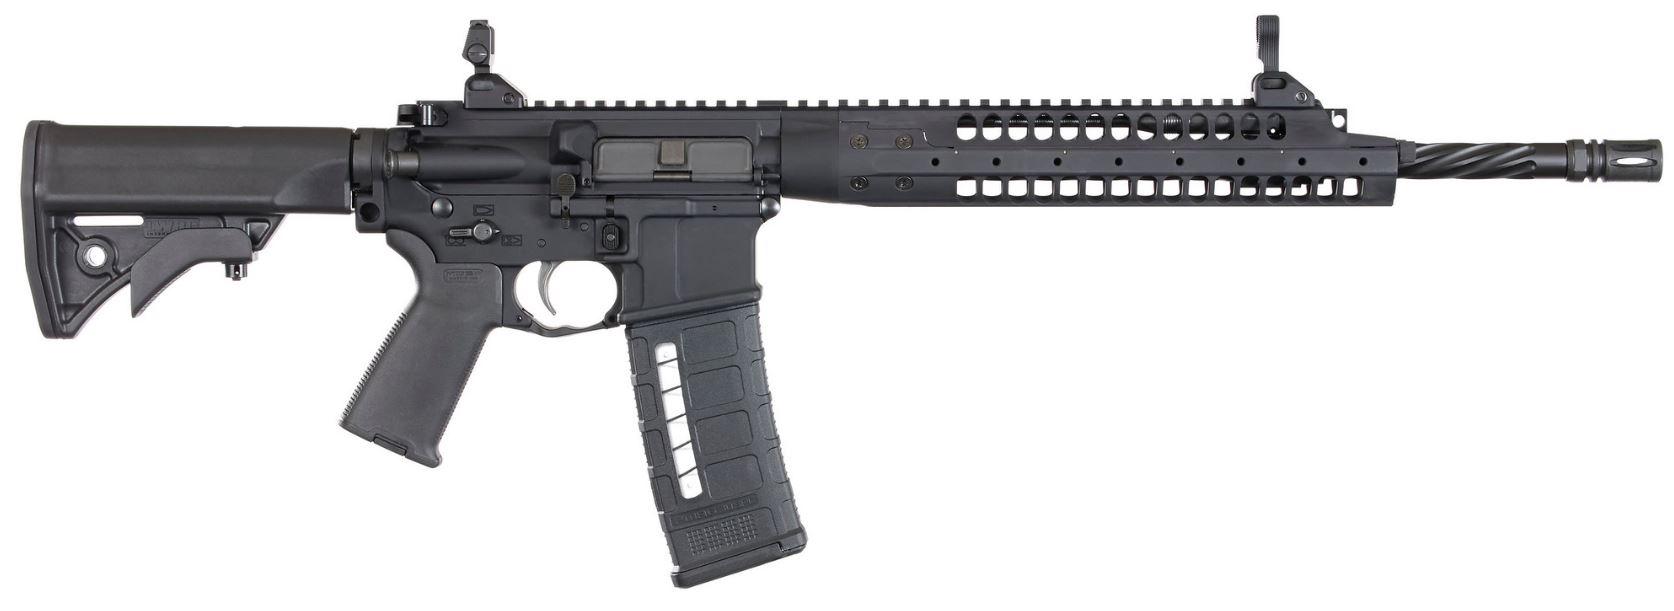 LWRC SIX8-A5 California Compliant 6.8mm SPC